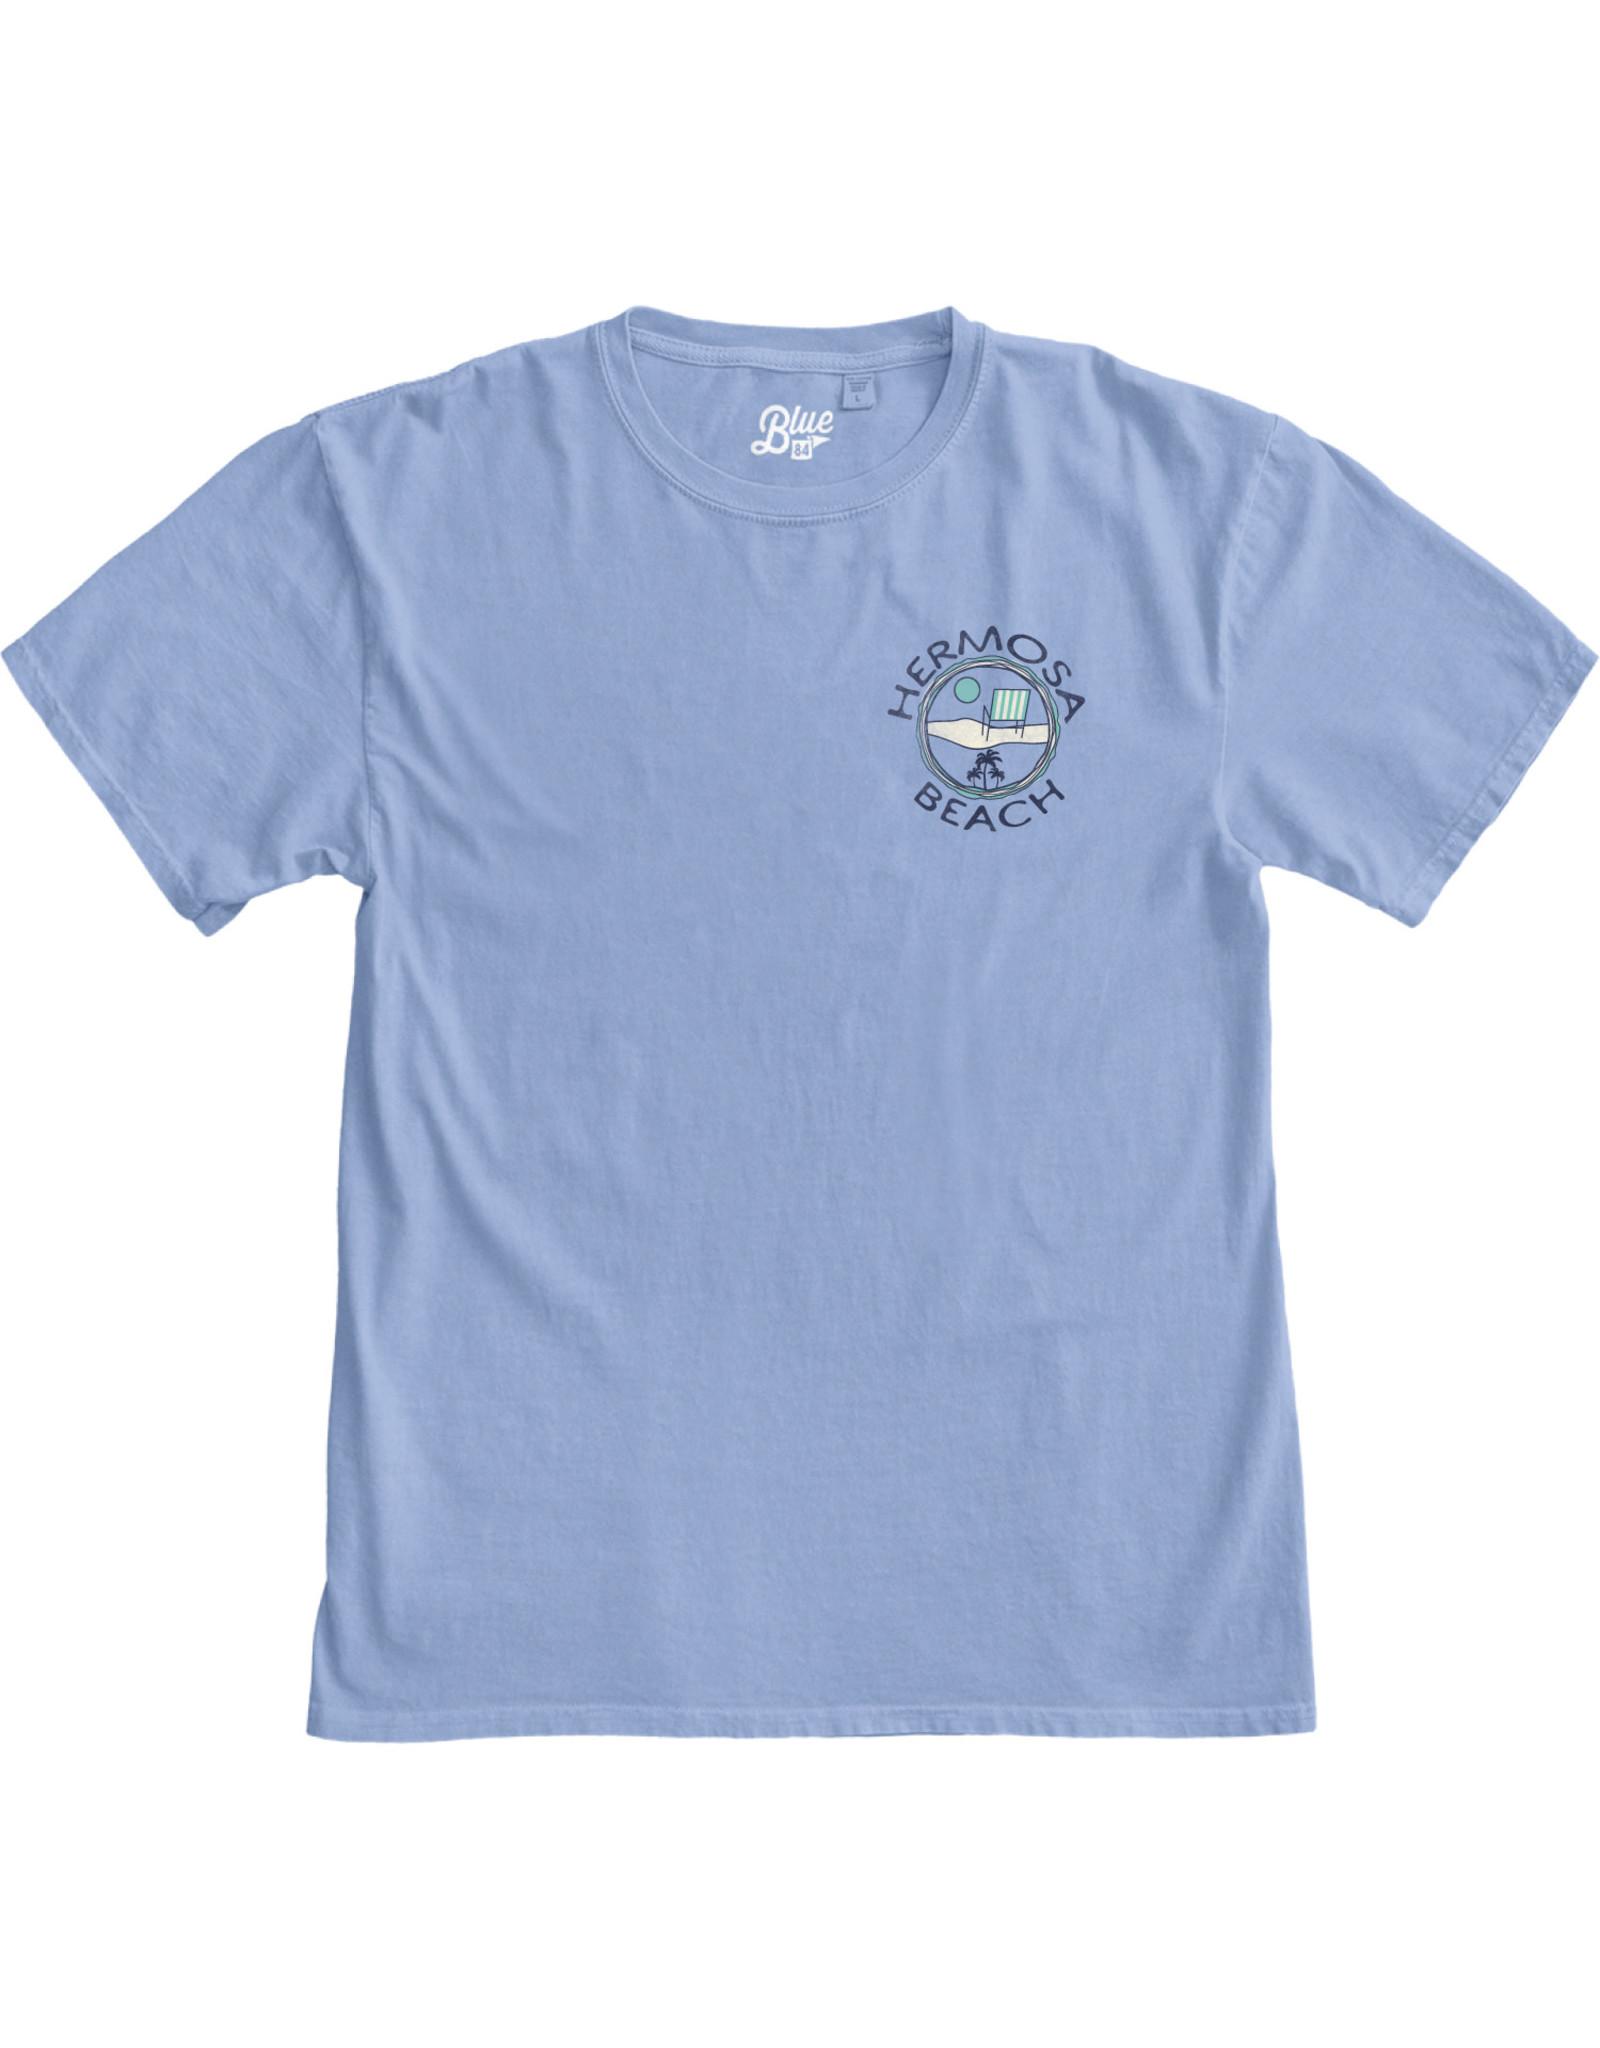 Lakeshirts INC. #228 SS HB HIPPIE SOUL SCREEN-RESORT